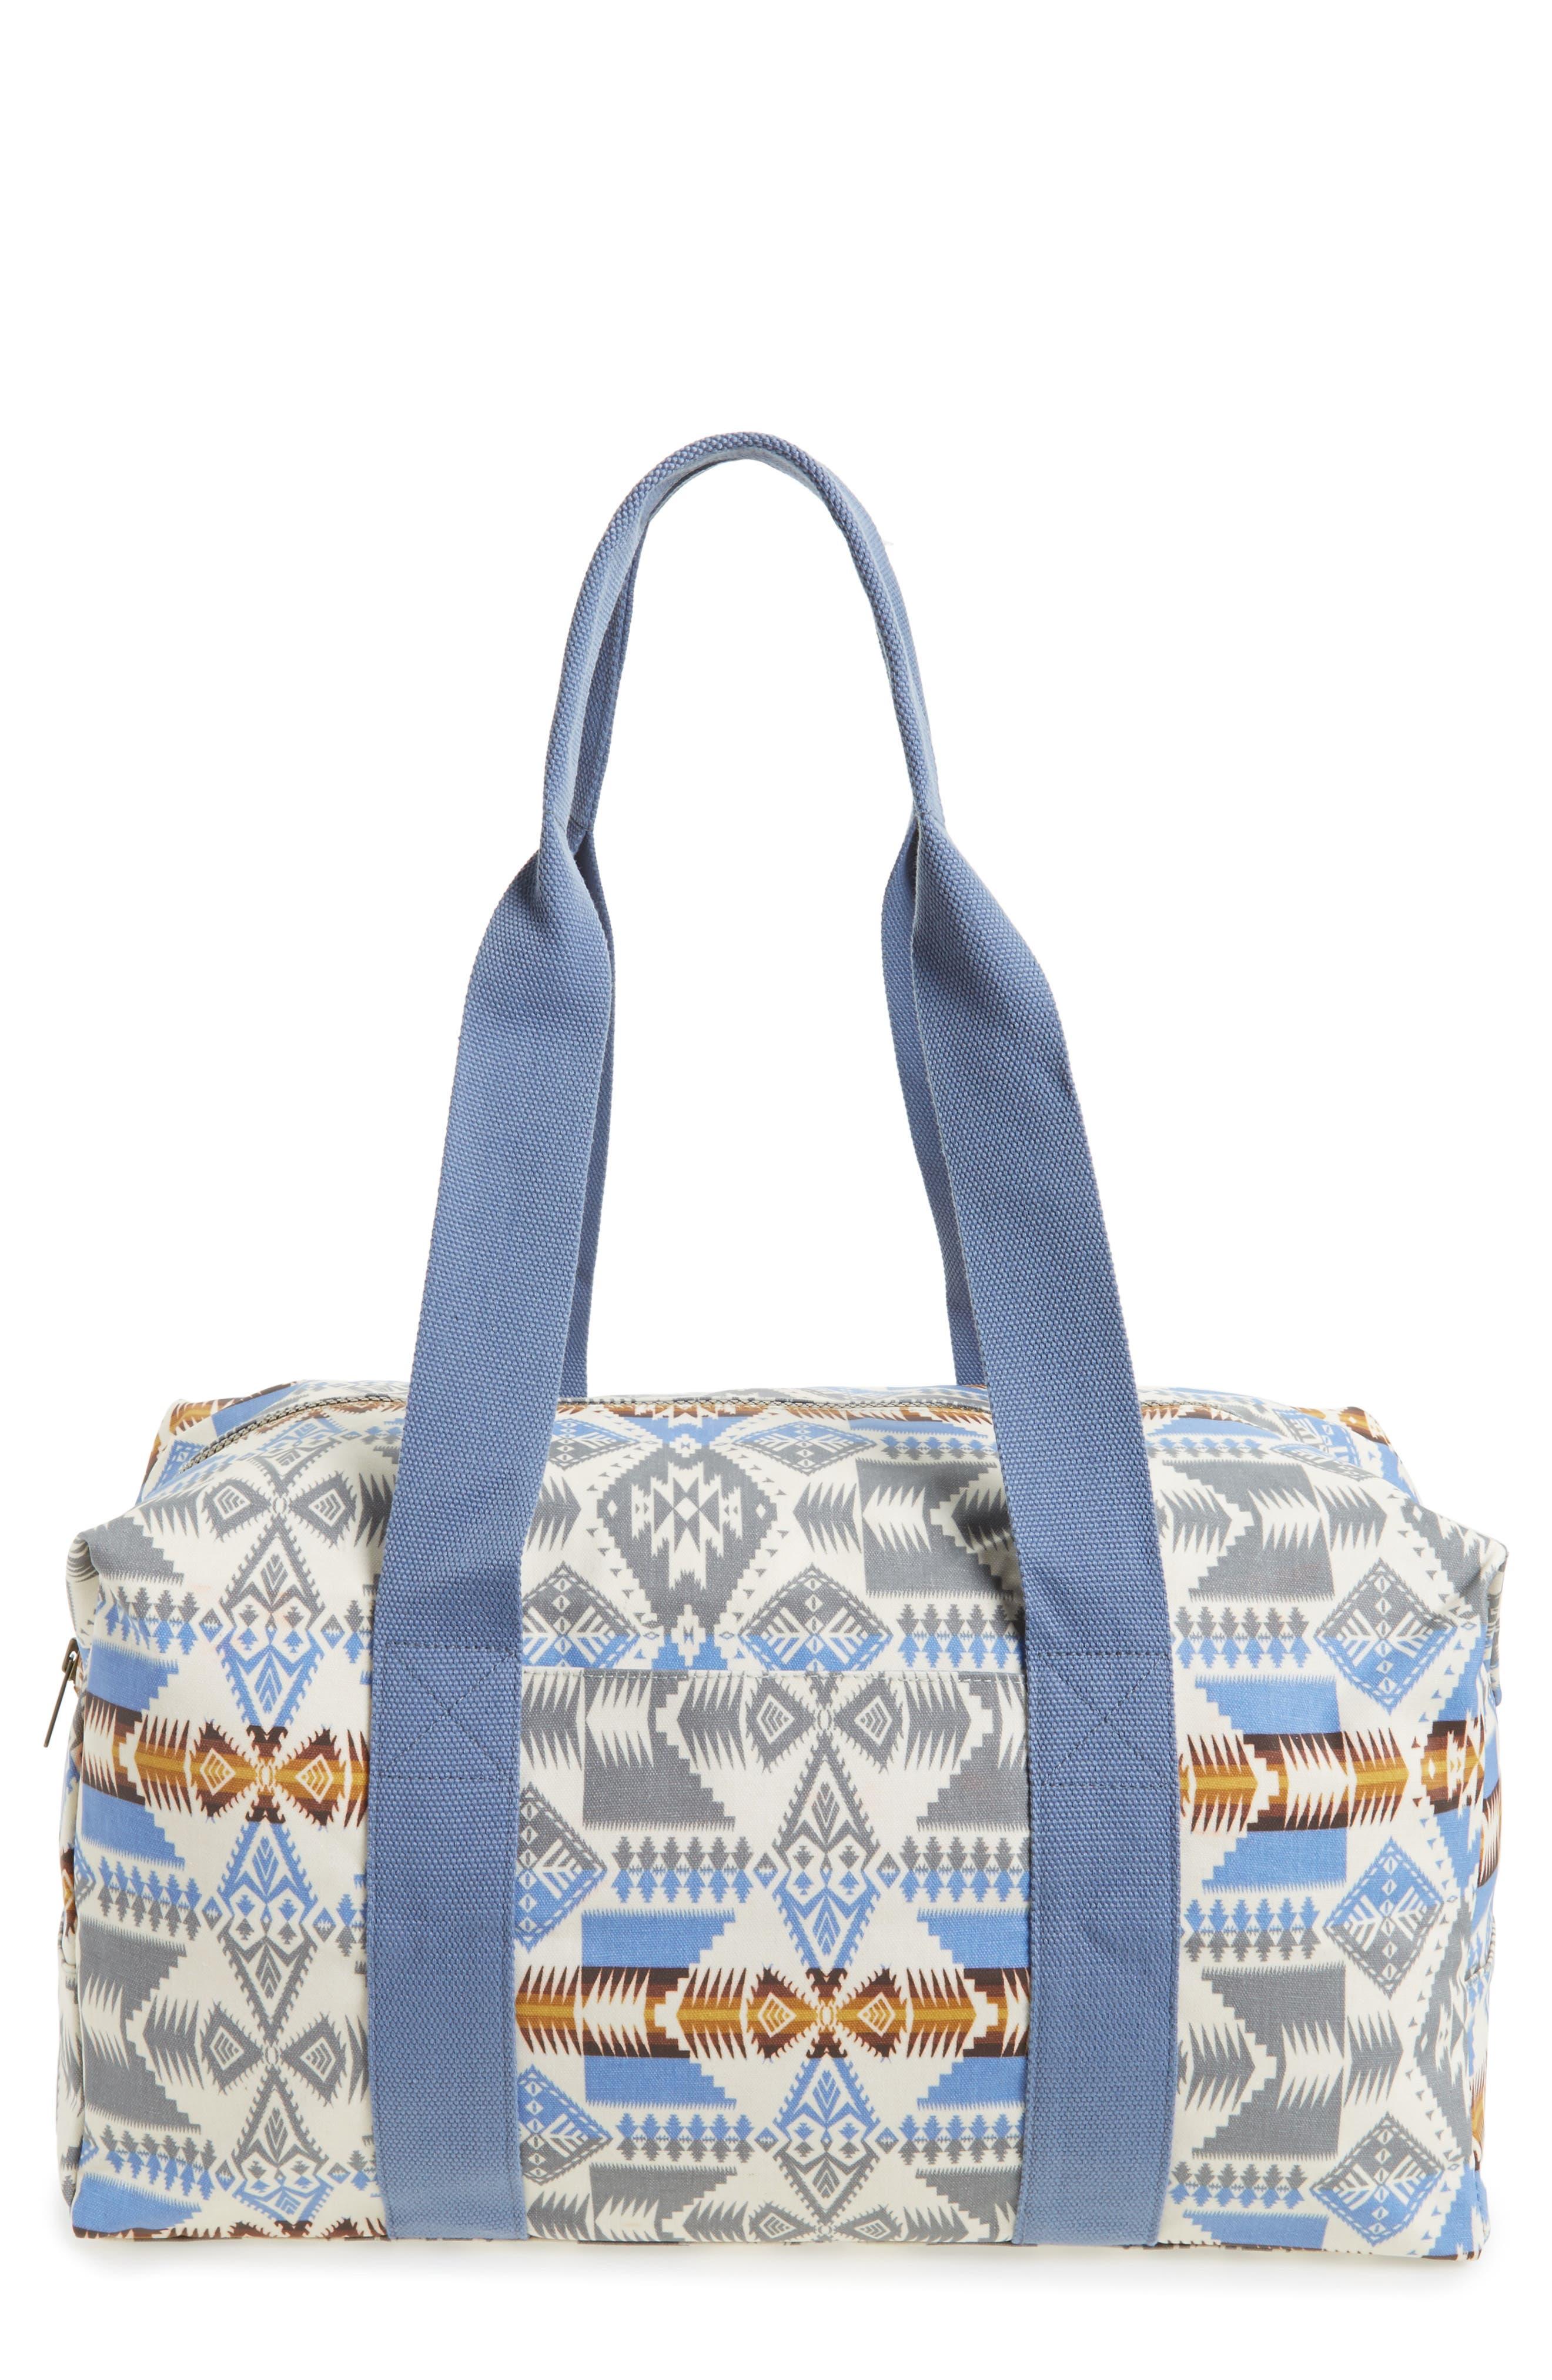 Canopy Duffel Bag,                         Main,                         color, 040